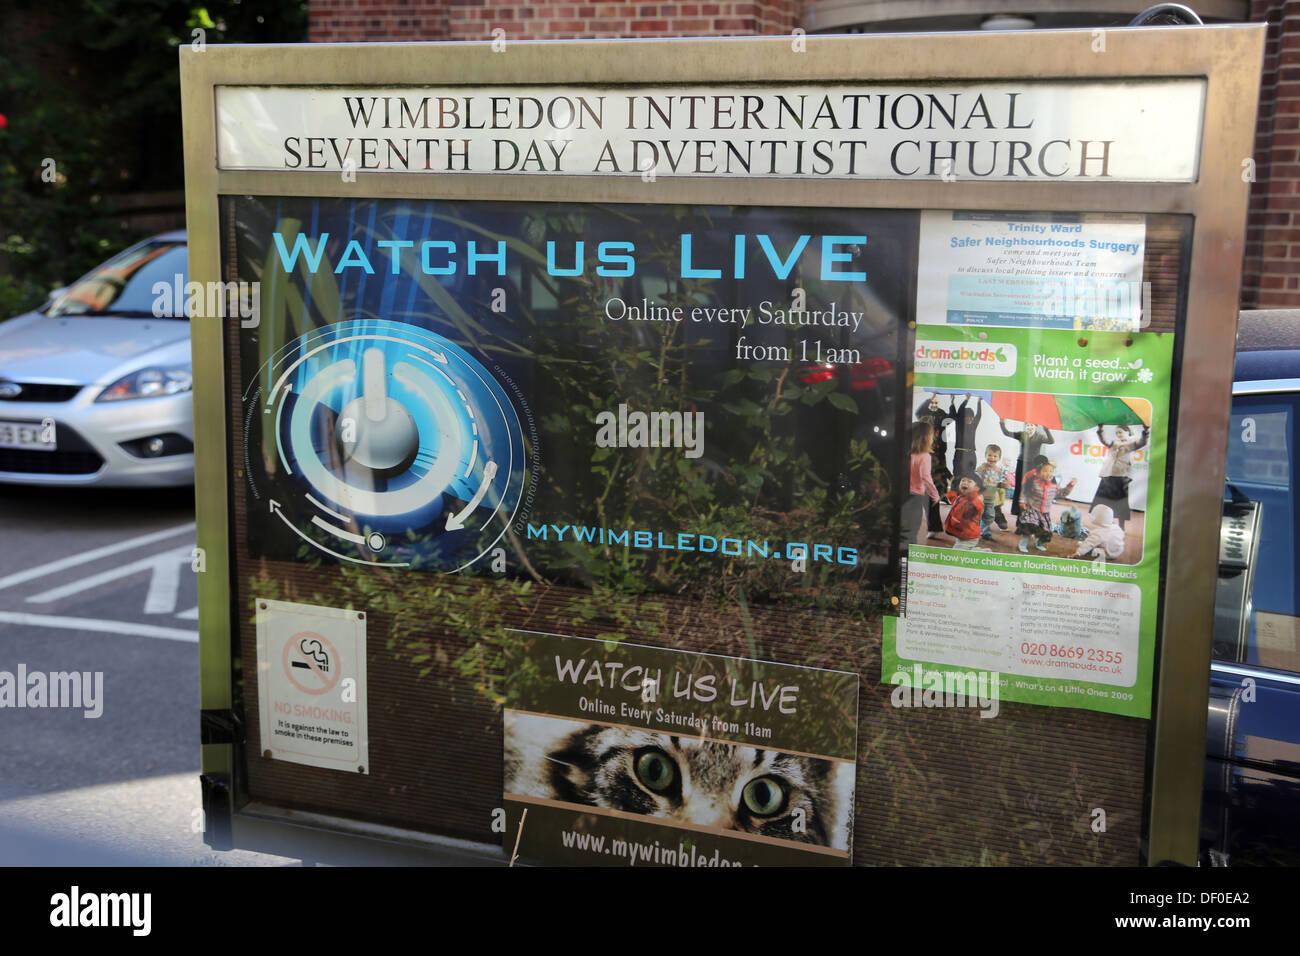 Wimbledon London England Wimbledon International Seventh Day Adventist Church Noticeboard - Stock Image